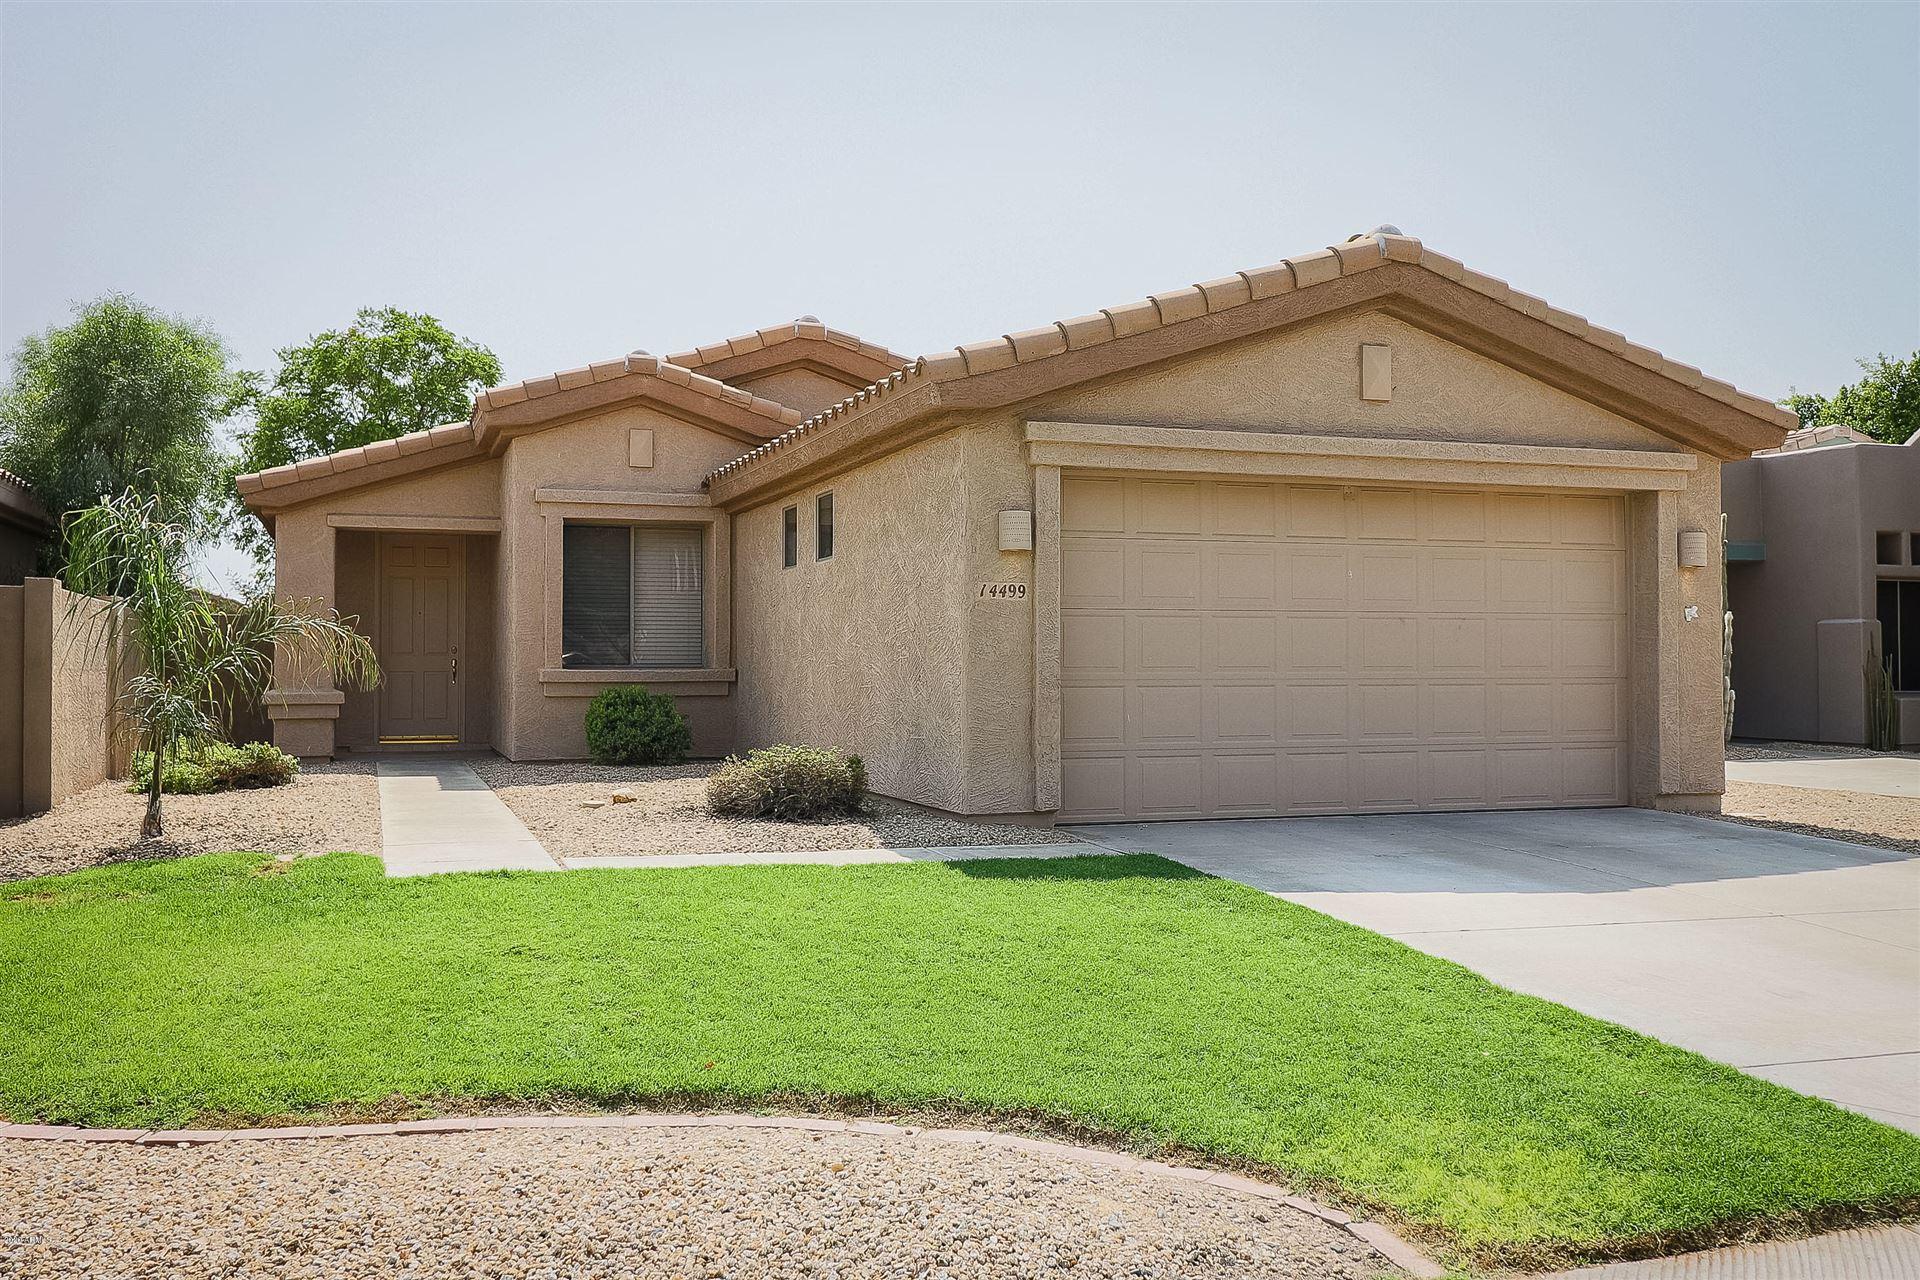 14499 W INDIANOLA Avenue, Goodyear, AZ 85395 - MLS#: 6134101